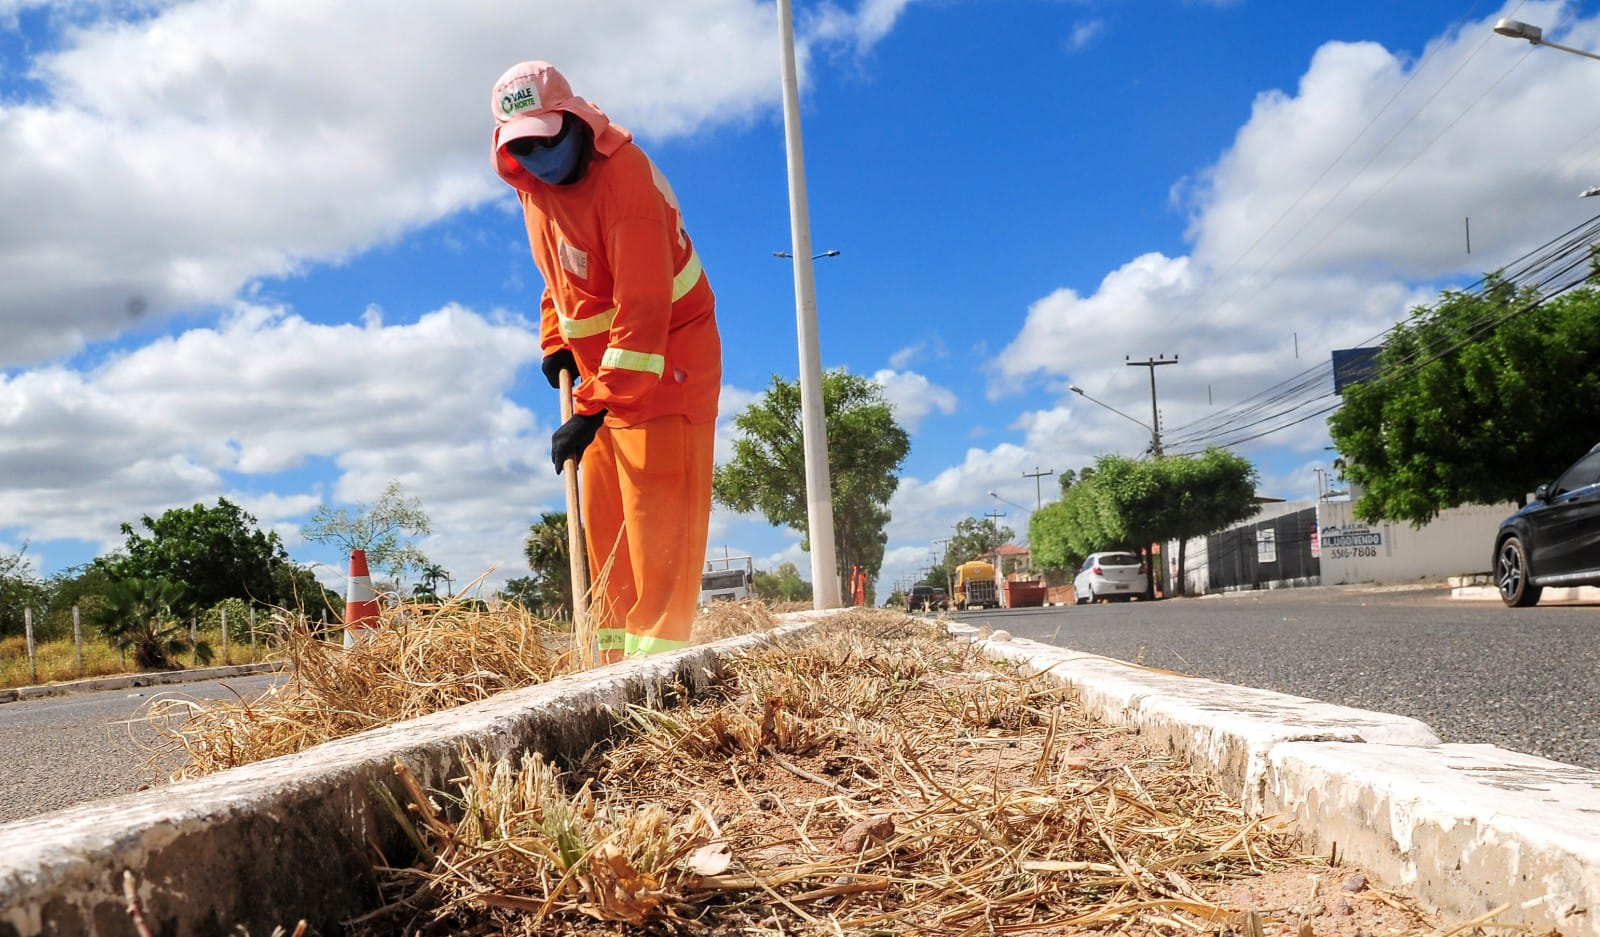 Costa e Silva recebe mutirão de limpeza urbana